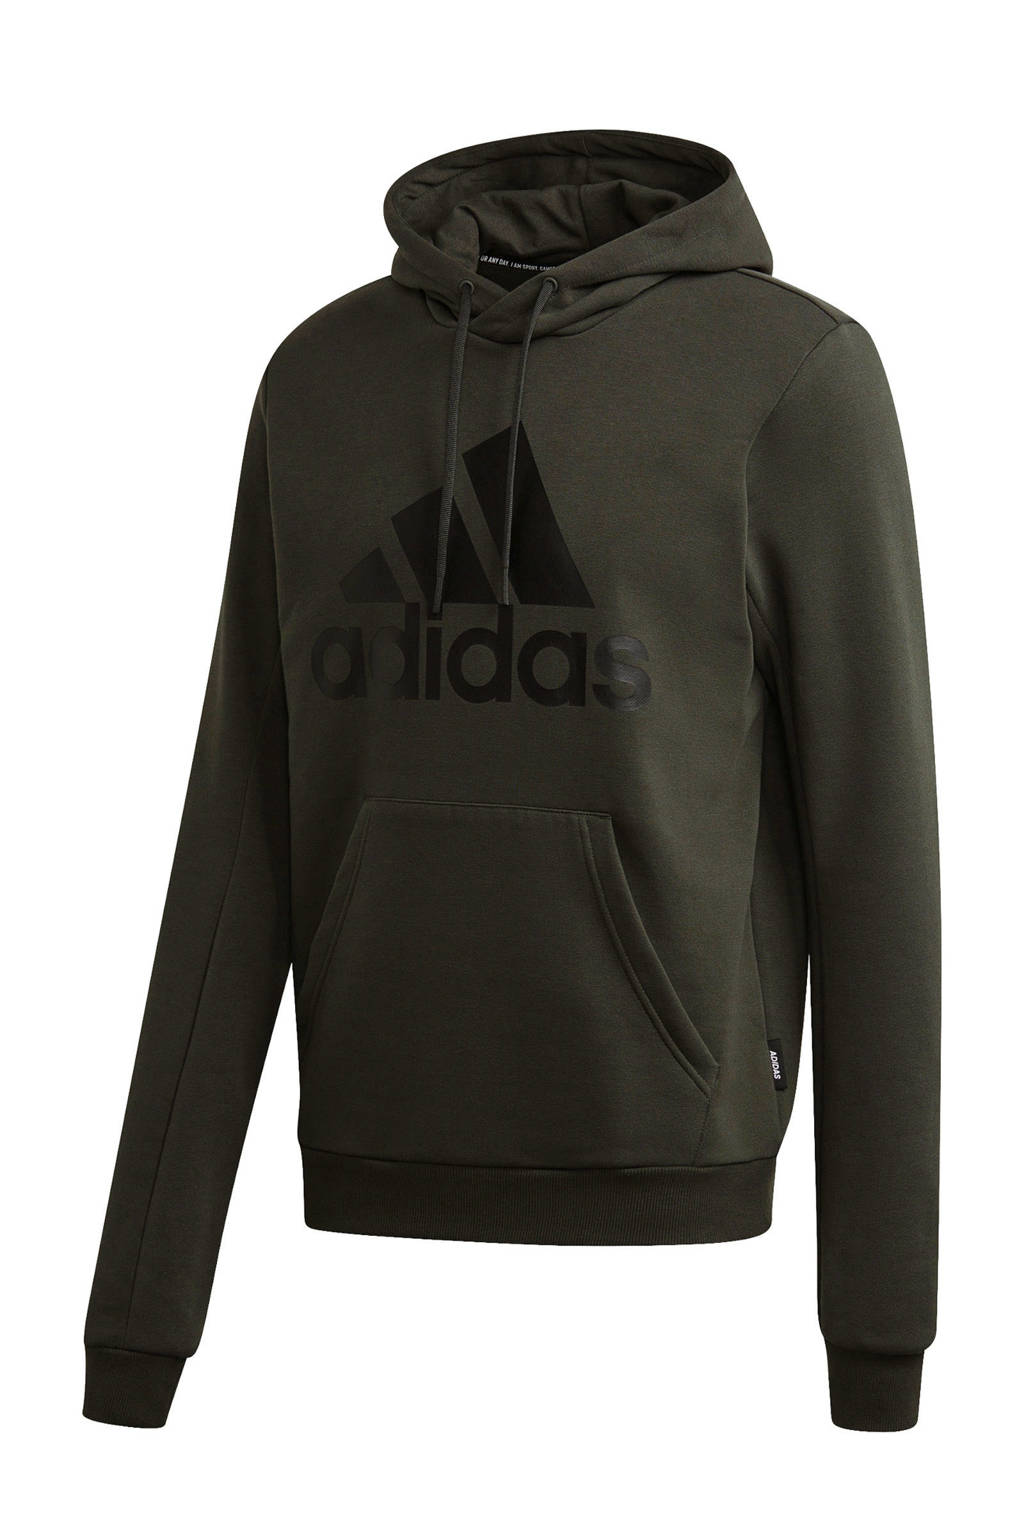 adidas Performance   sportsweater donkergroen, Donkergroen